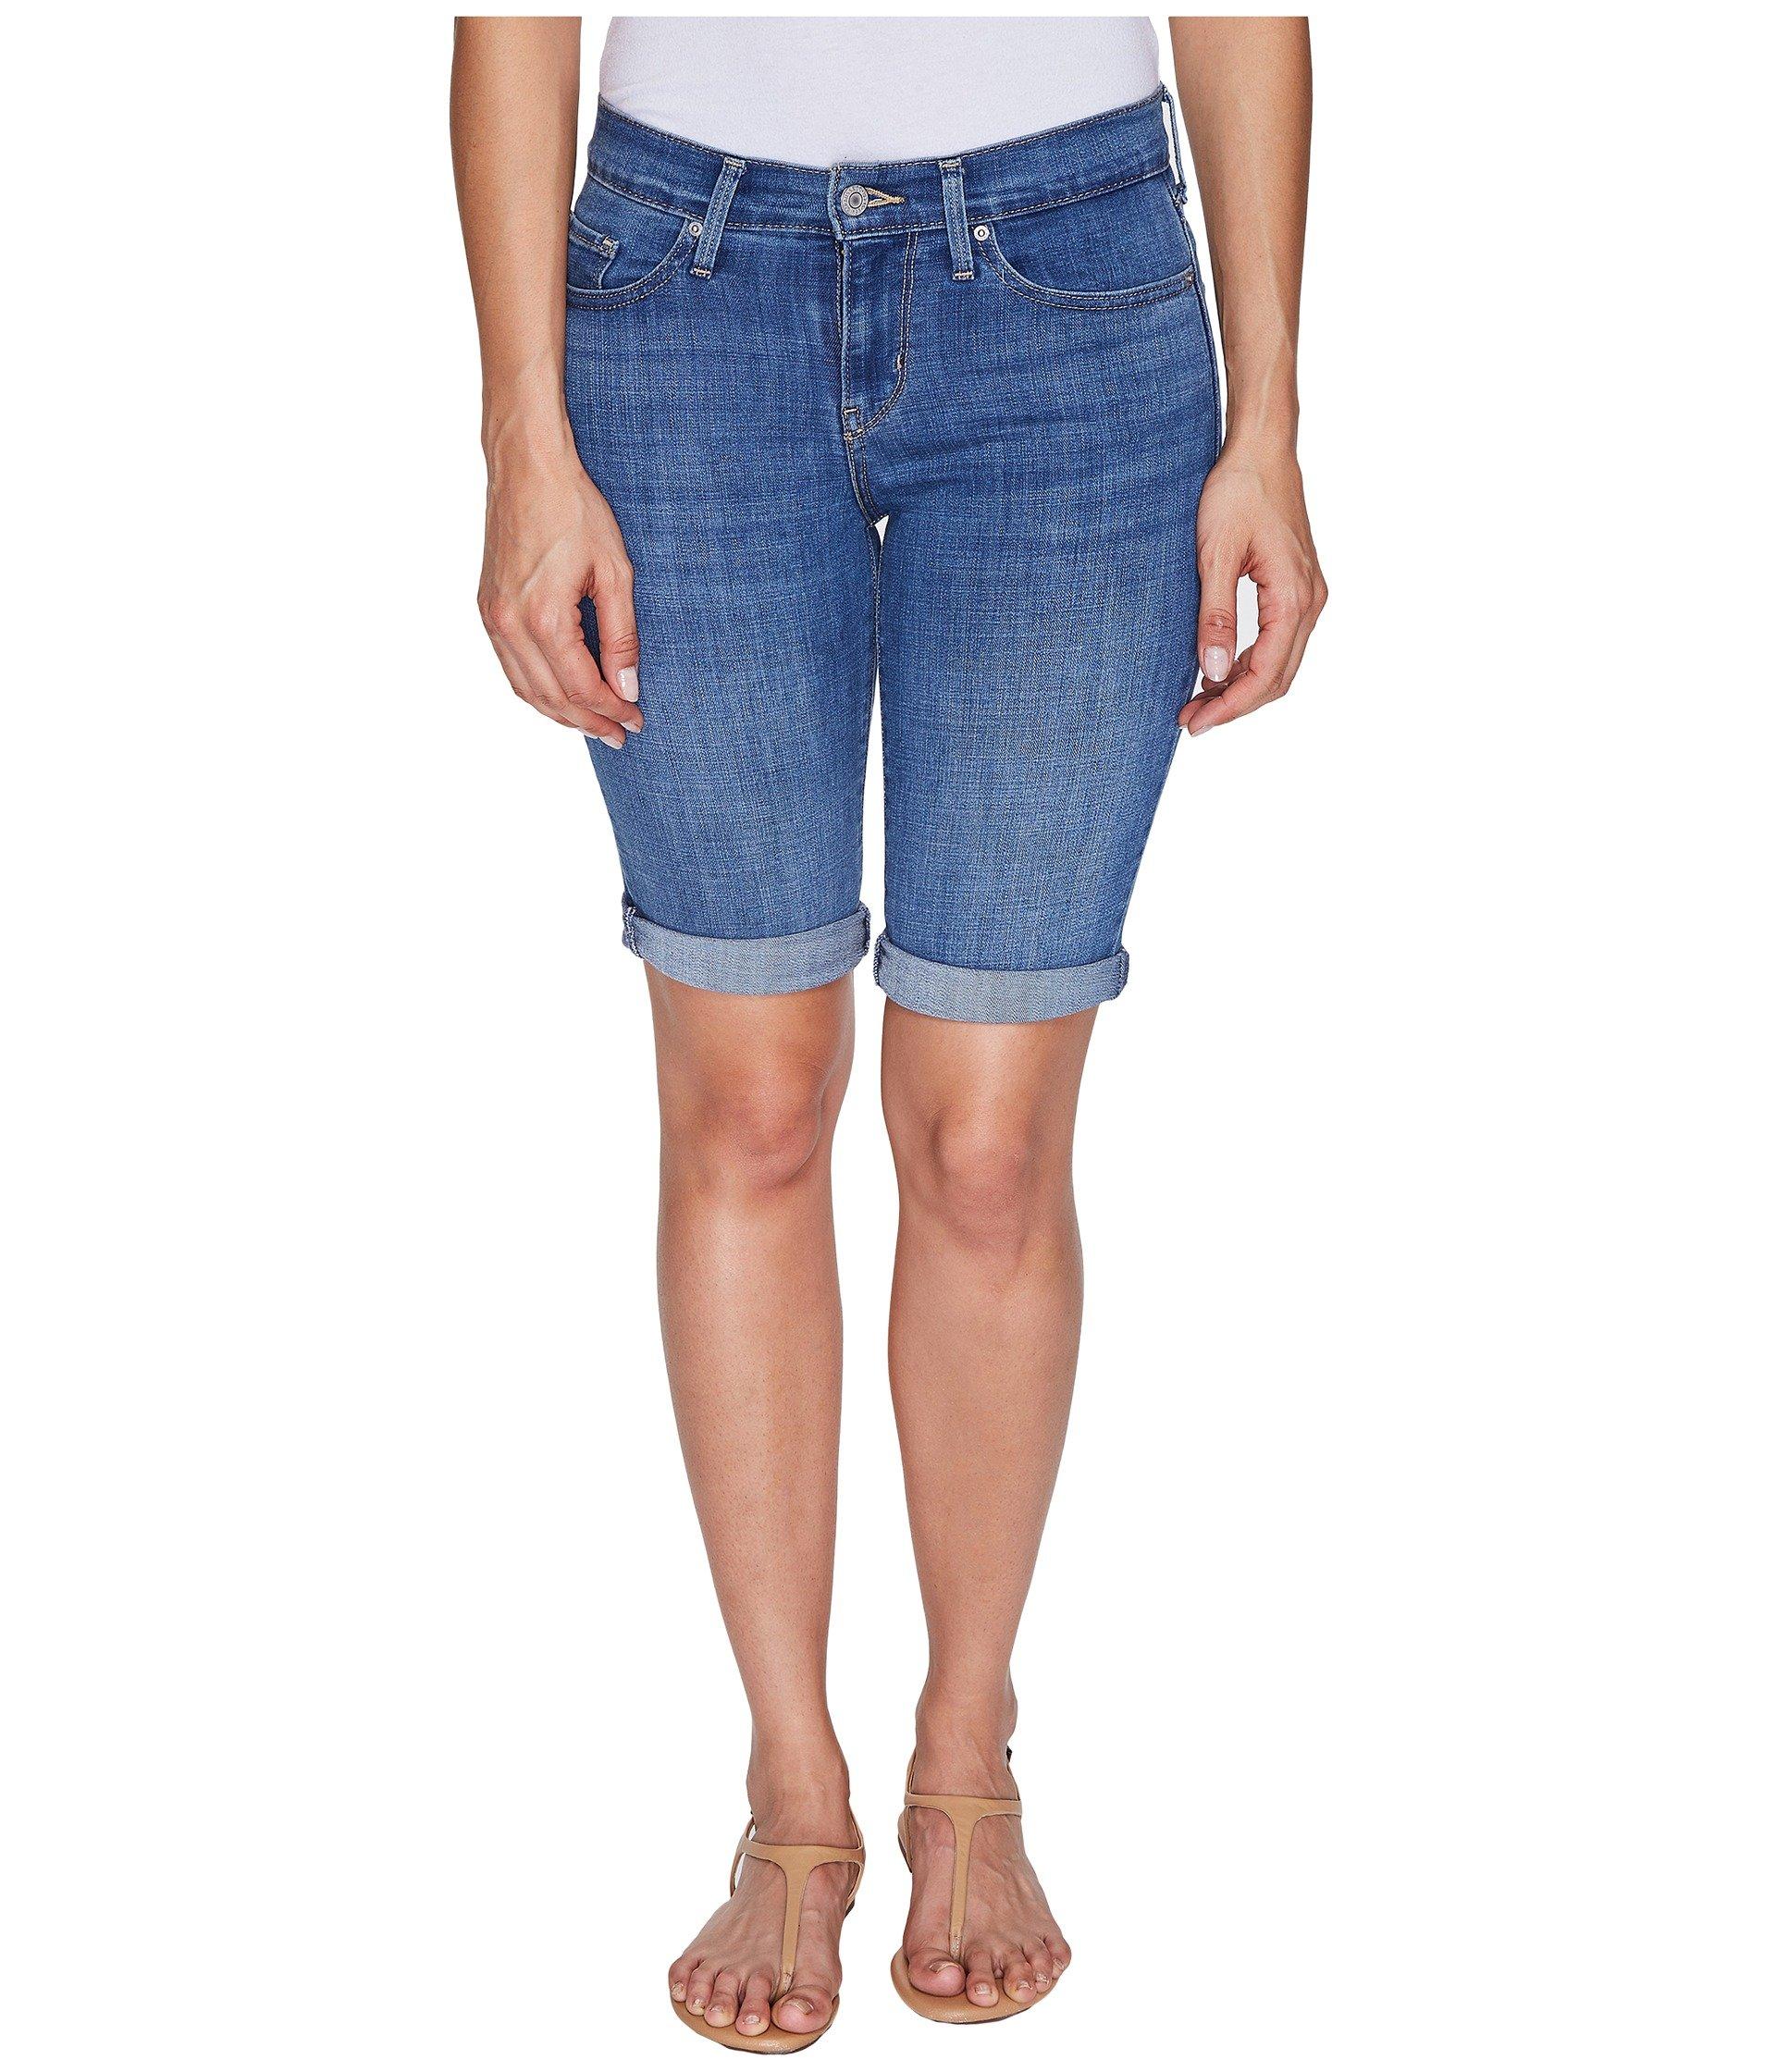 Levi's® Womens Bermuda Shorts at Zappos.com